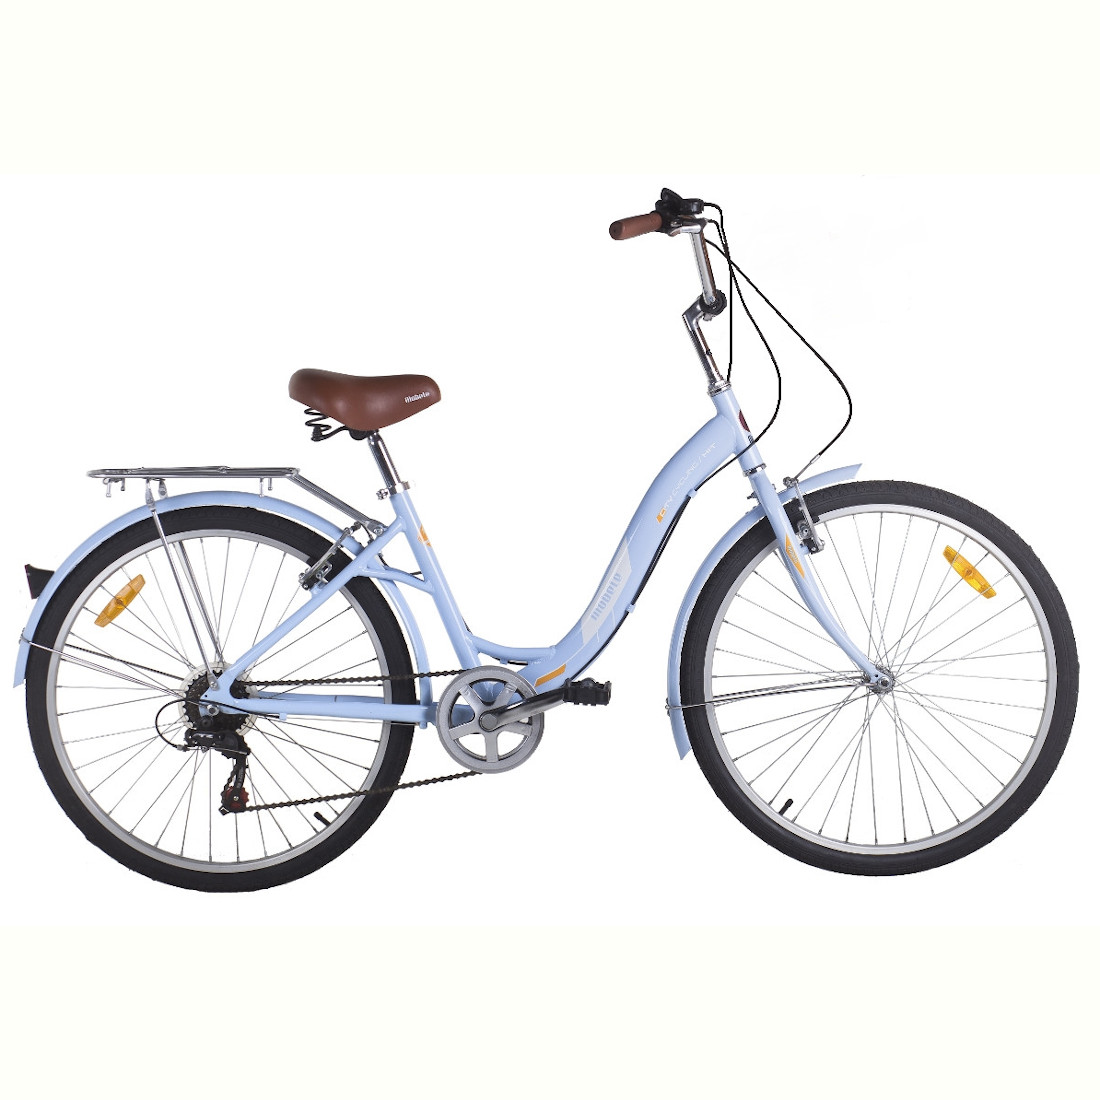 Bicicleta Vintage Retrô Aro 26 Alumínio 7V Azul Hit City Mobele